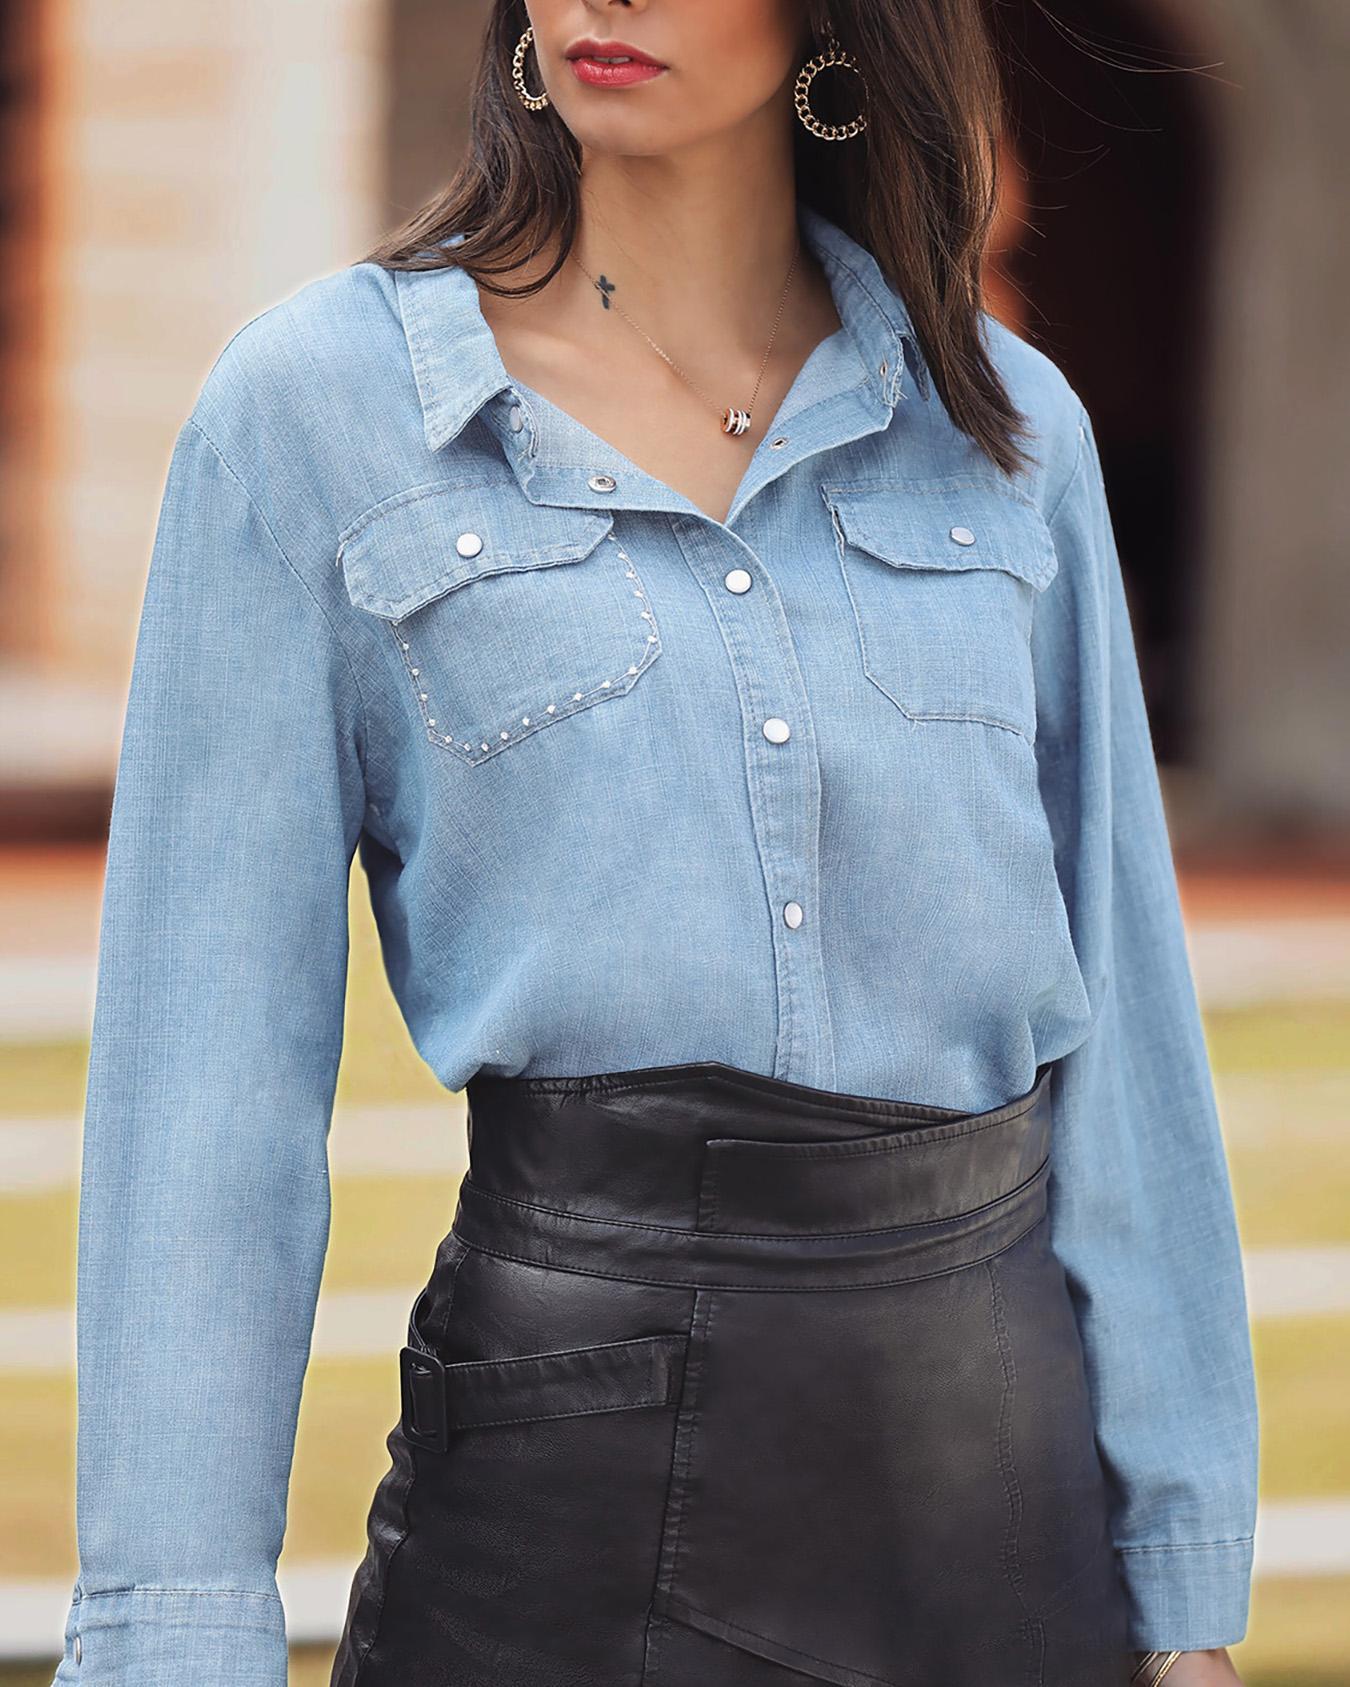 ivrose / Denim Star Embroidery Button Up Blusa